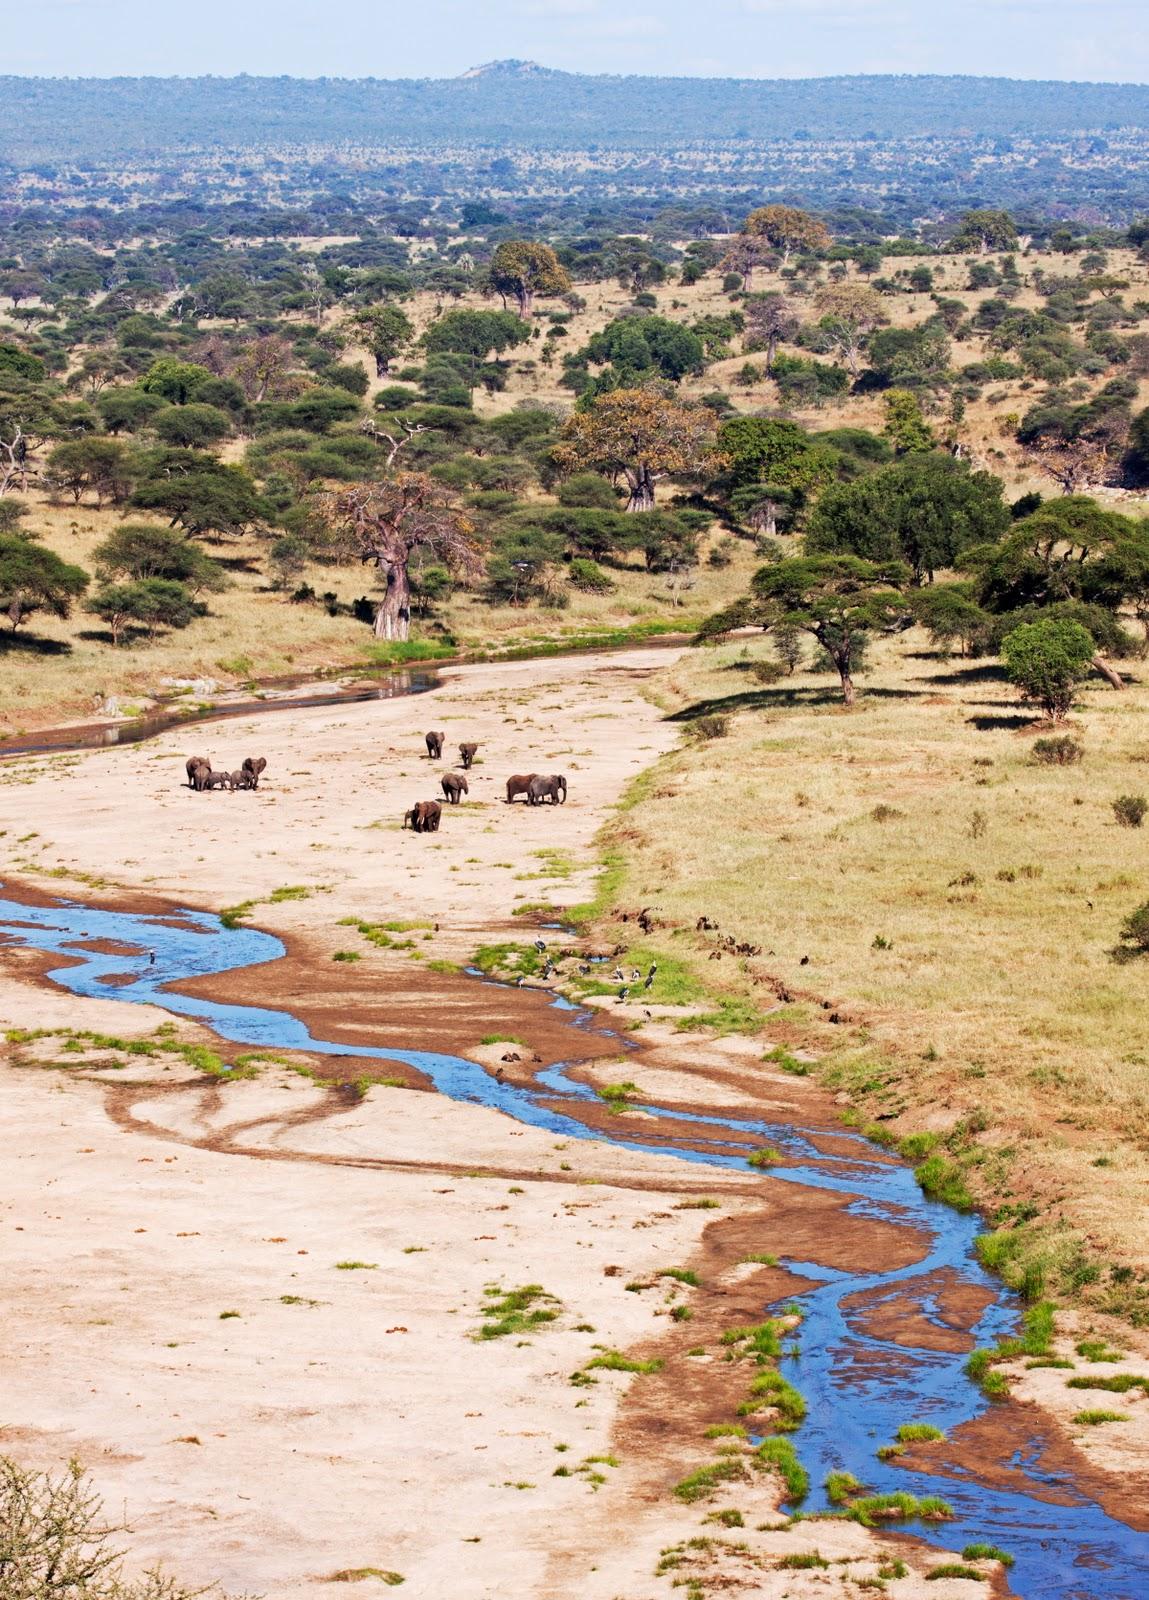 Quintessential African scene from Tarangire National Park, Tanzania